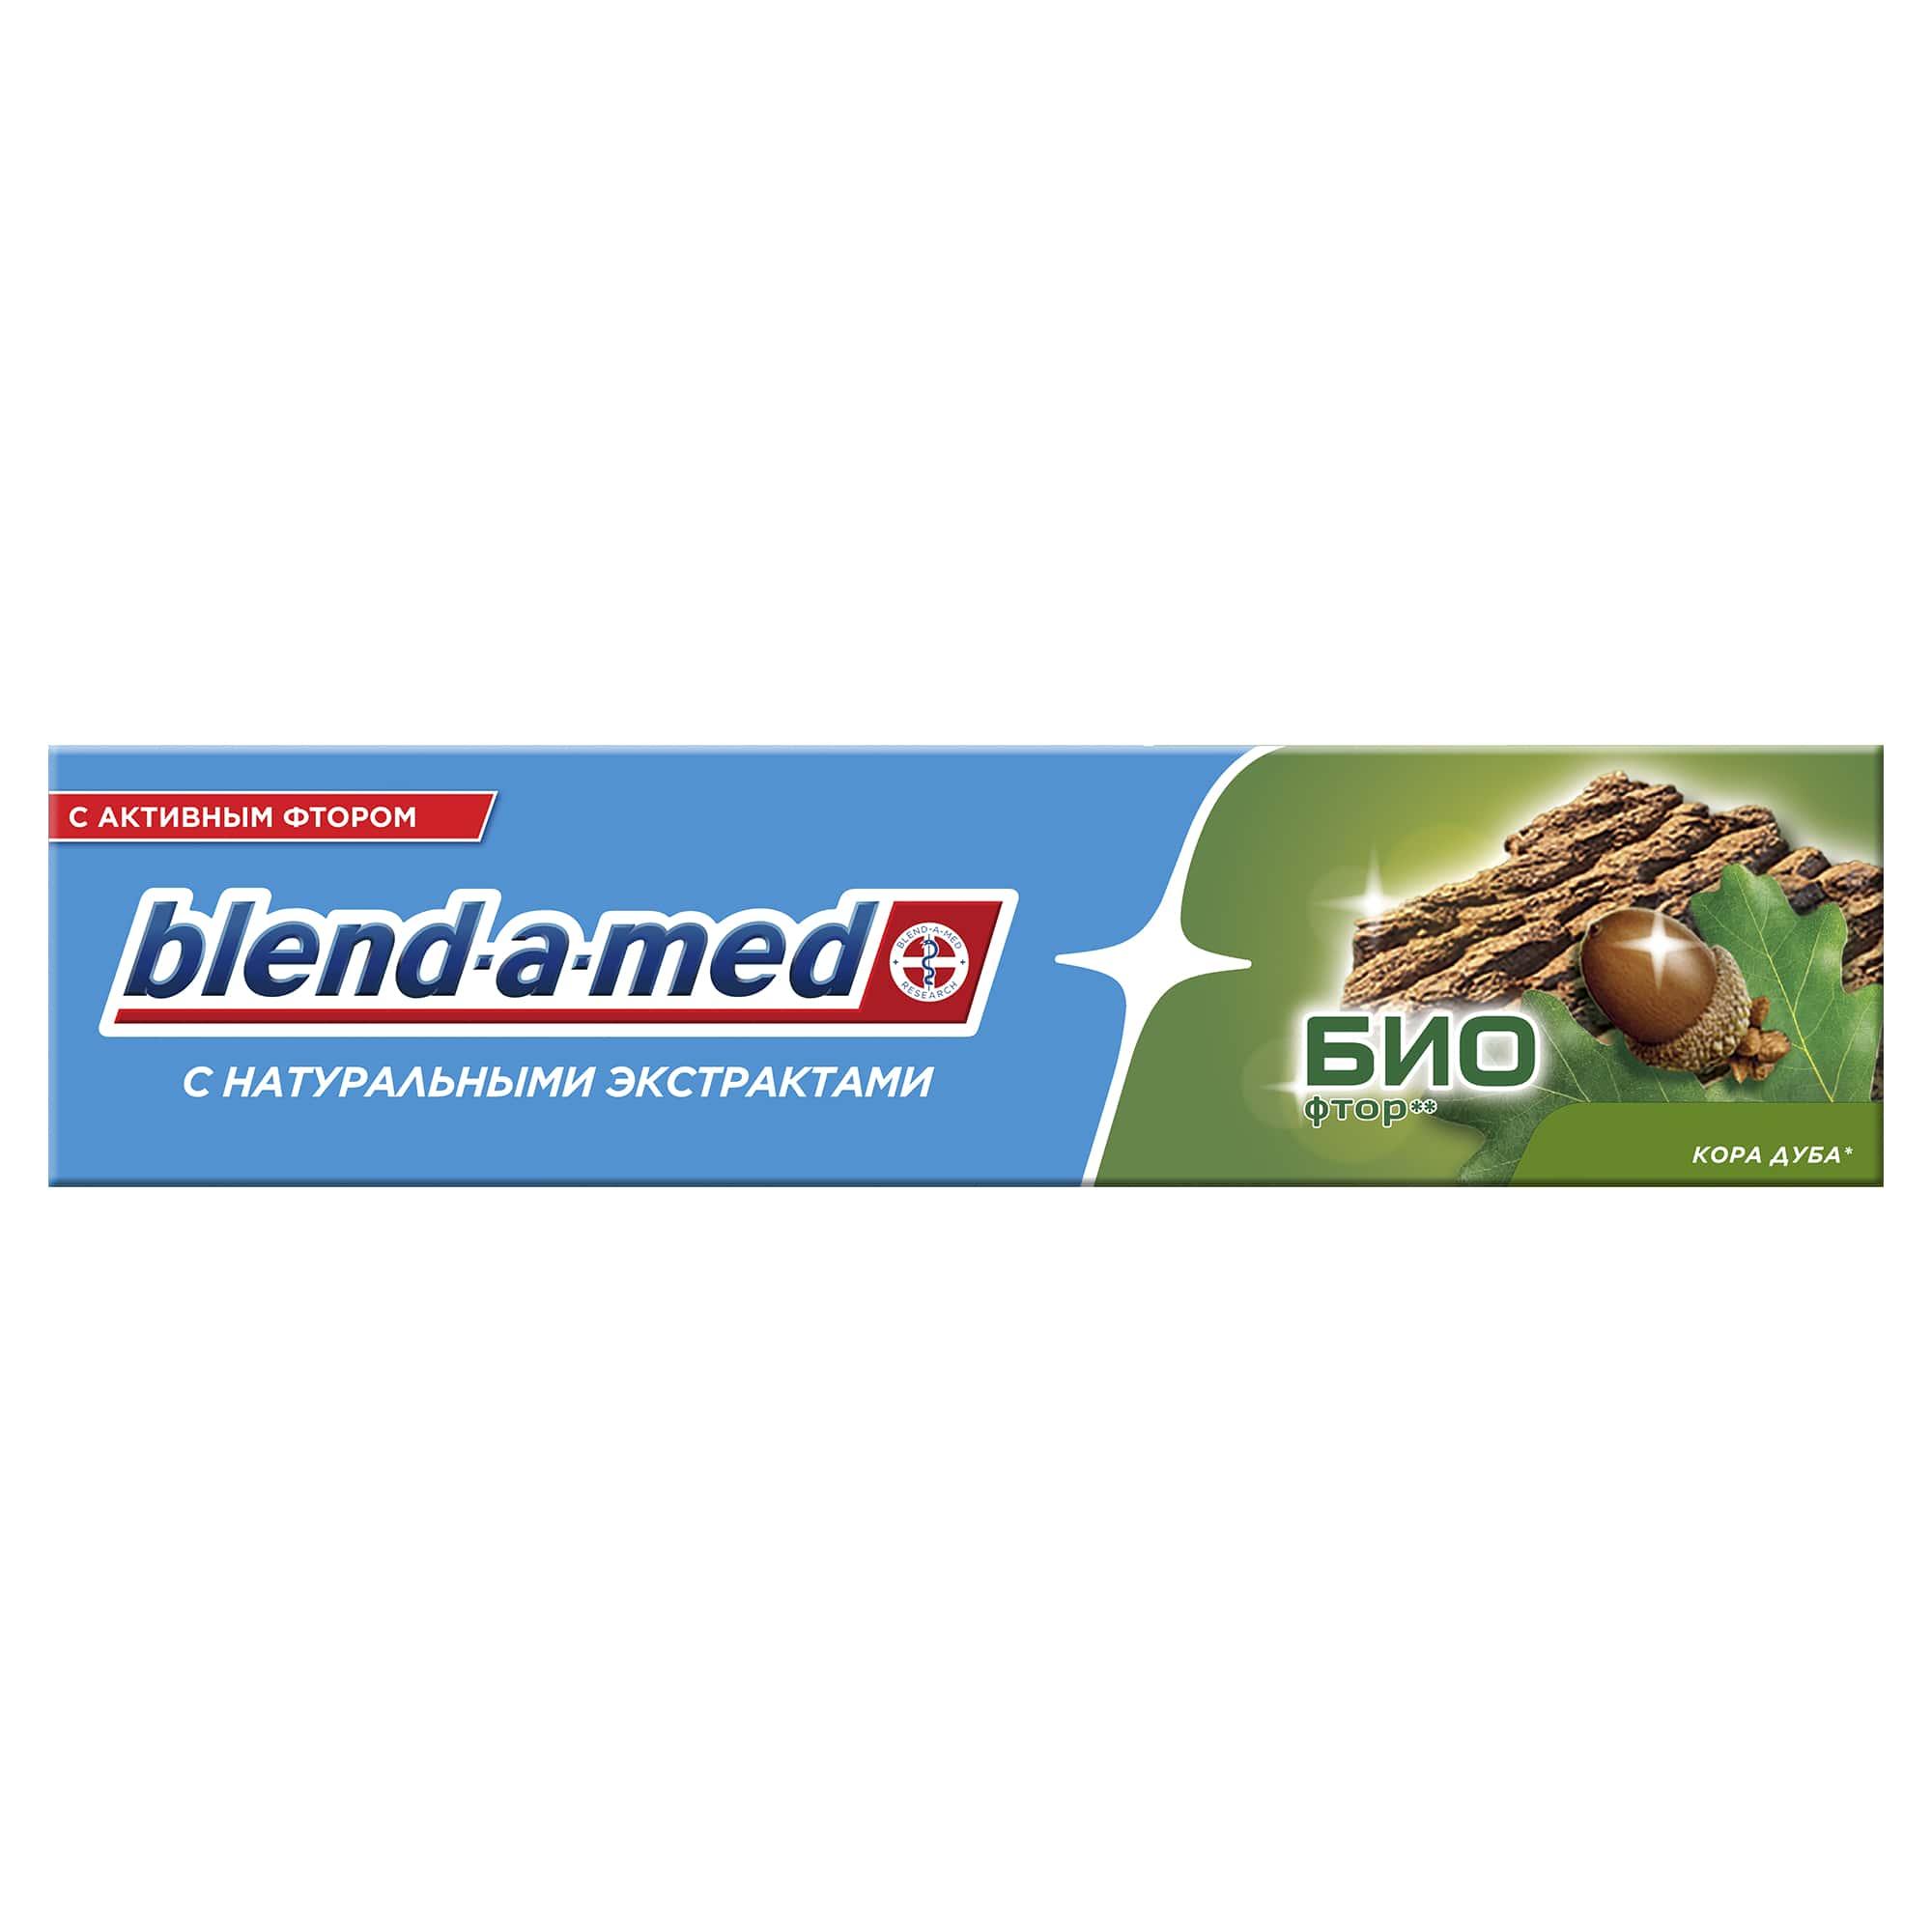 Купить Зубная паста Blend-a-med Кора Дуба 100мл, зубная паста 81497032